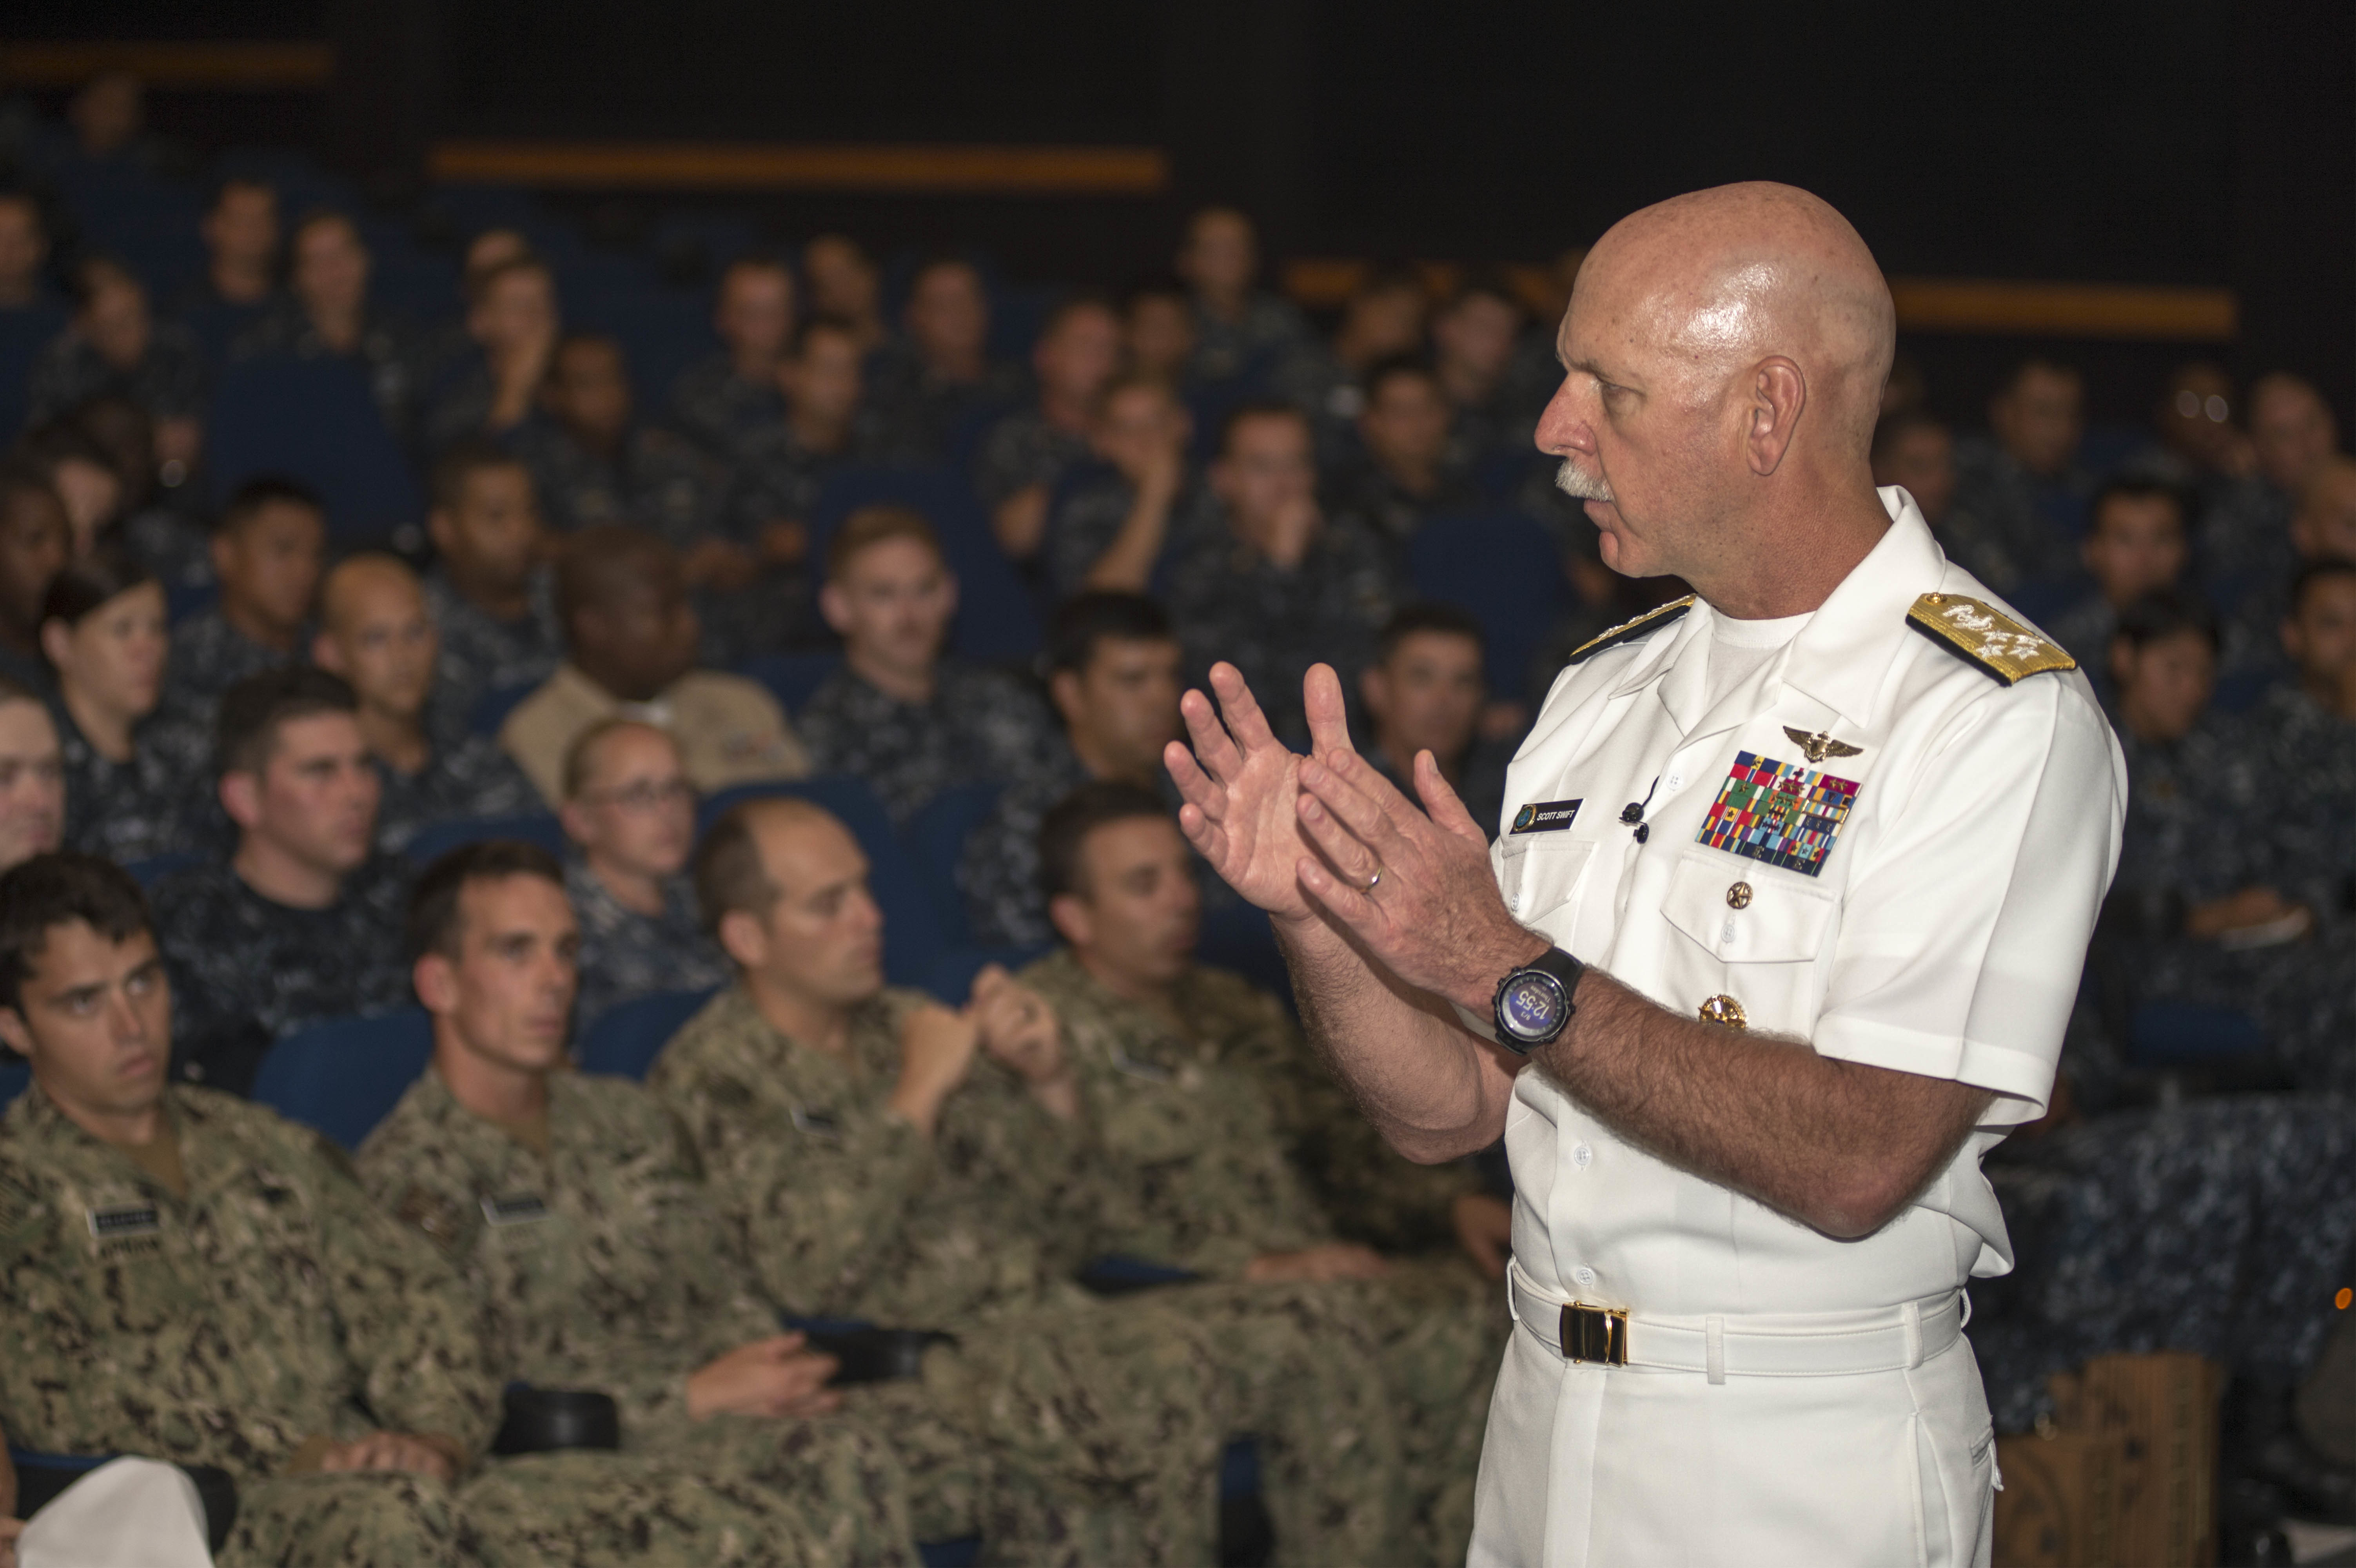 150903-N-YW024-057 PEARL HARBOR (Sept. 3, 2015) Adm. Scott Swift, commander of U.S. Pacific Fleet on Sept. 3, 2015. US Navy Photo